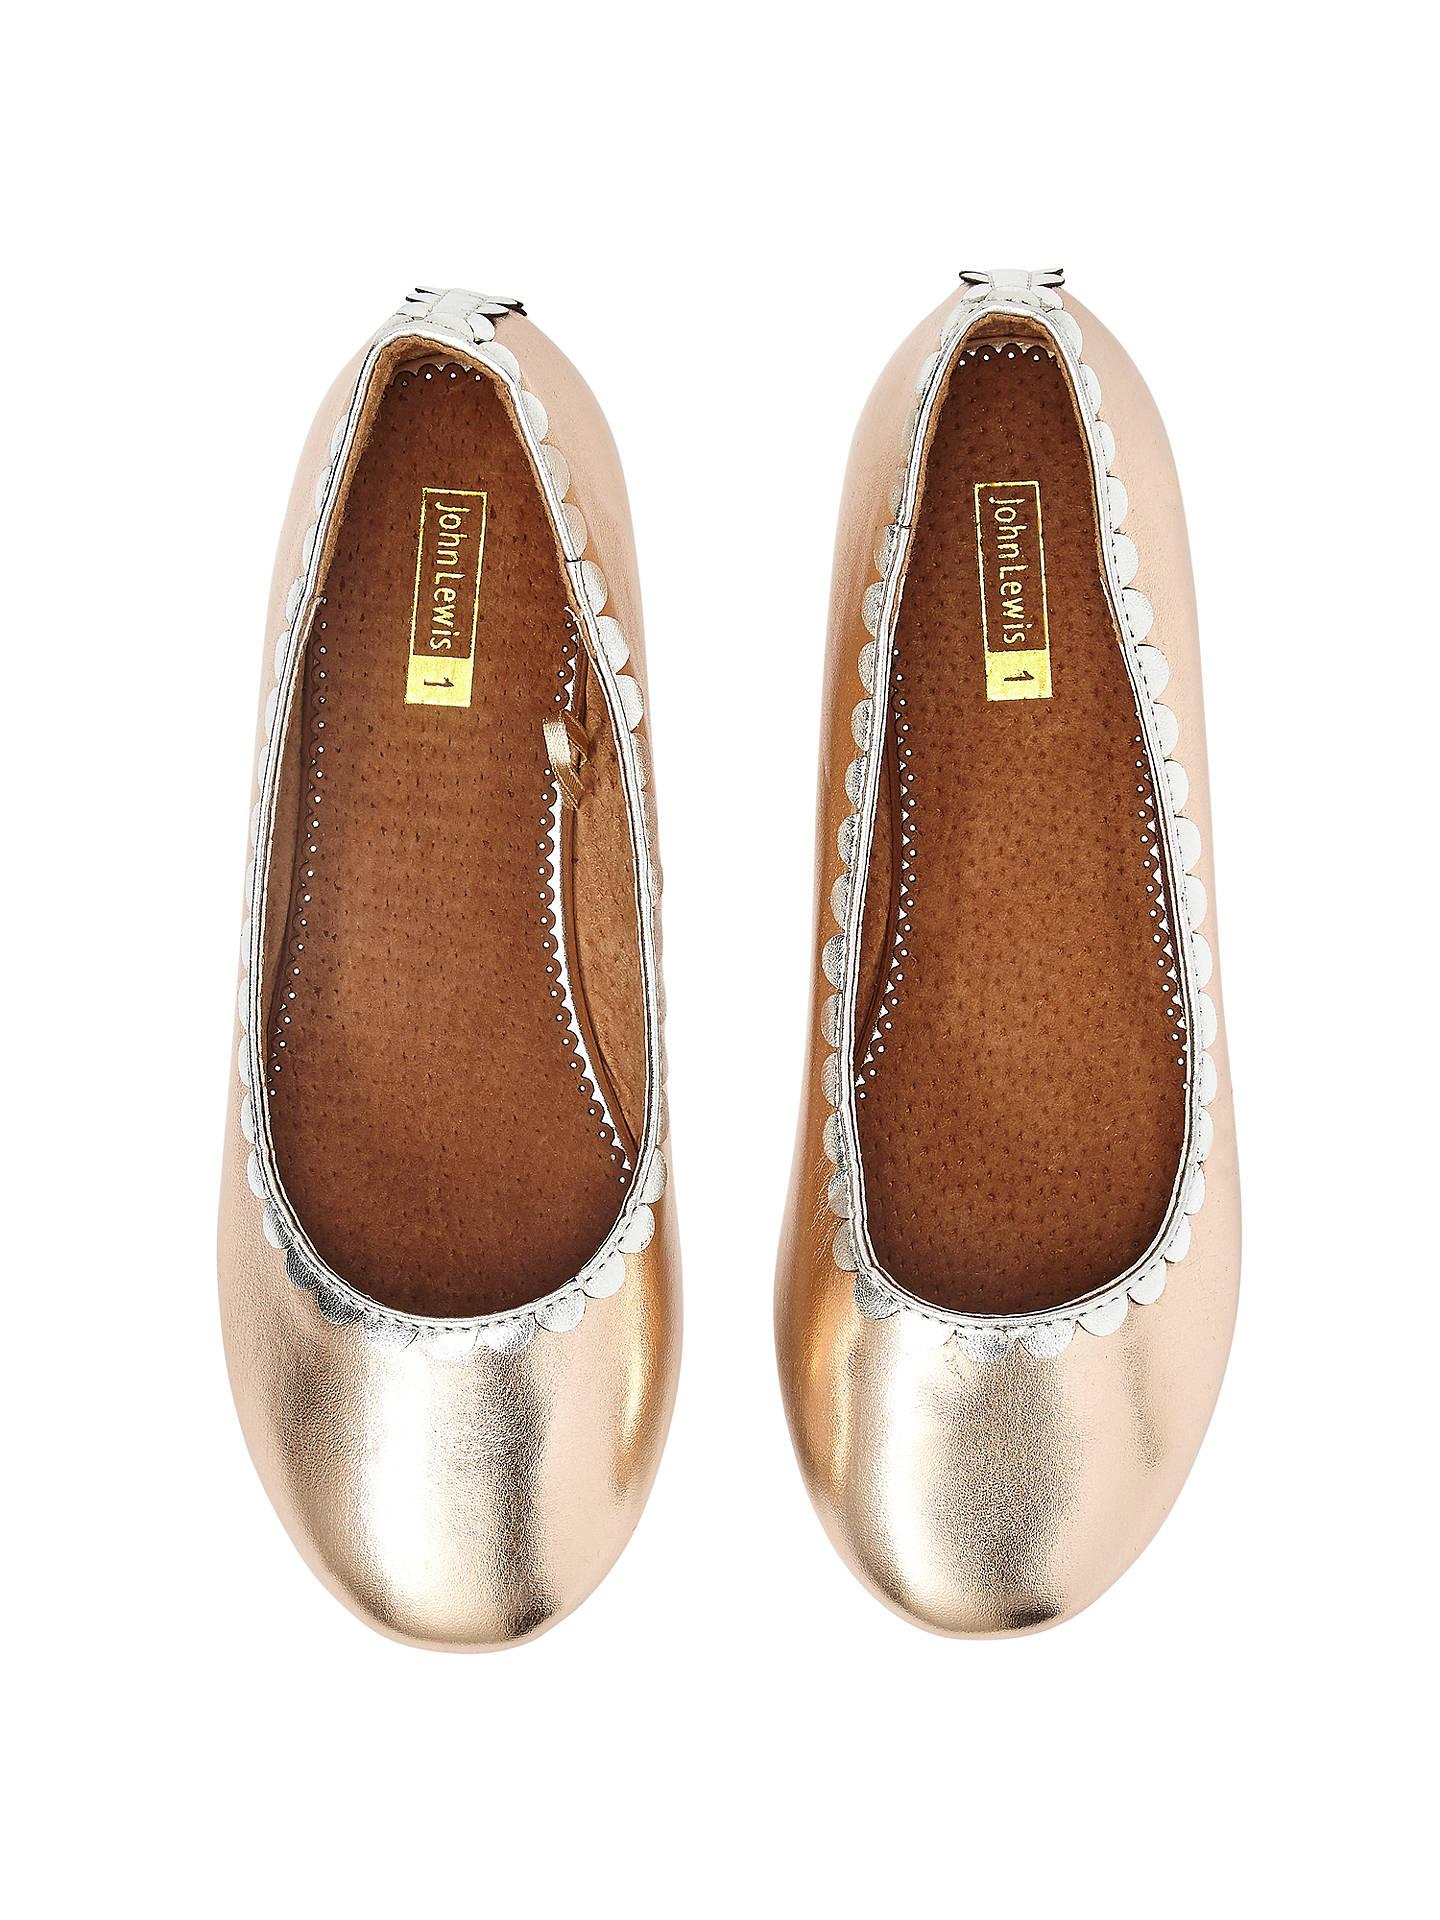 209c79e345c6 ... Buy John Lewis Children s Darcy Scallop Shoes